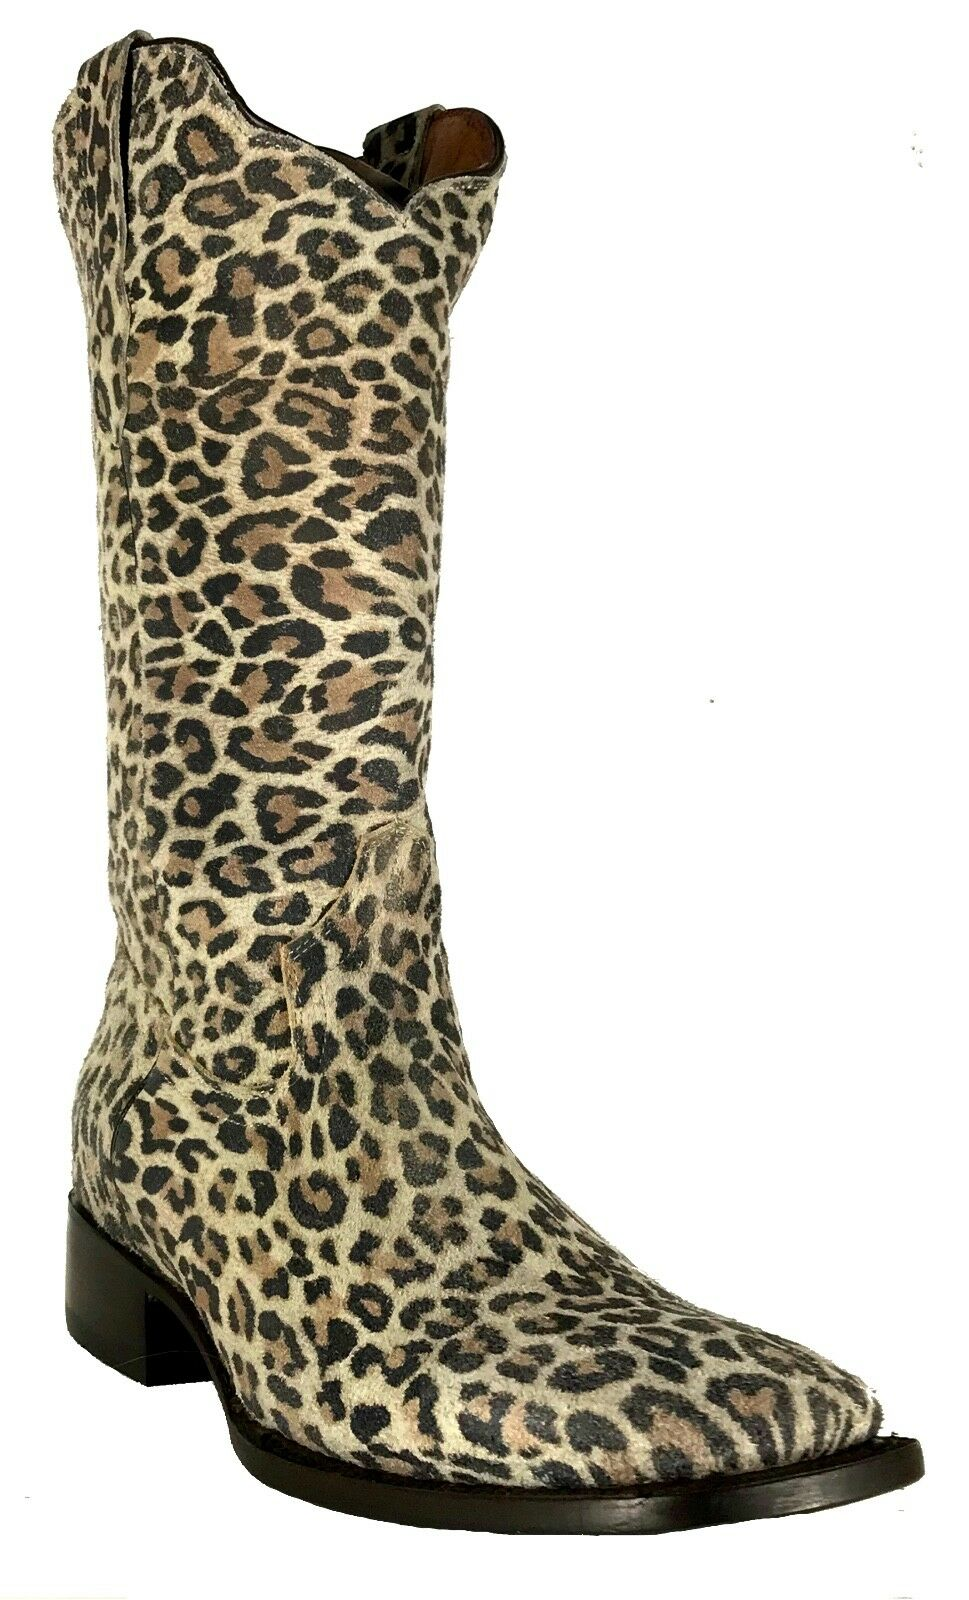 Wouomo New Leopard Design Leather Cowgirl Western stivali Sand Square Sale